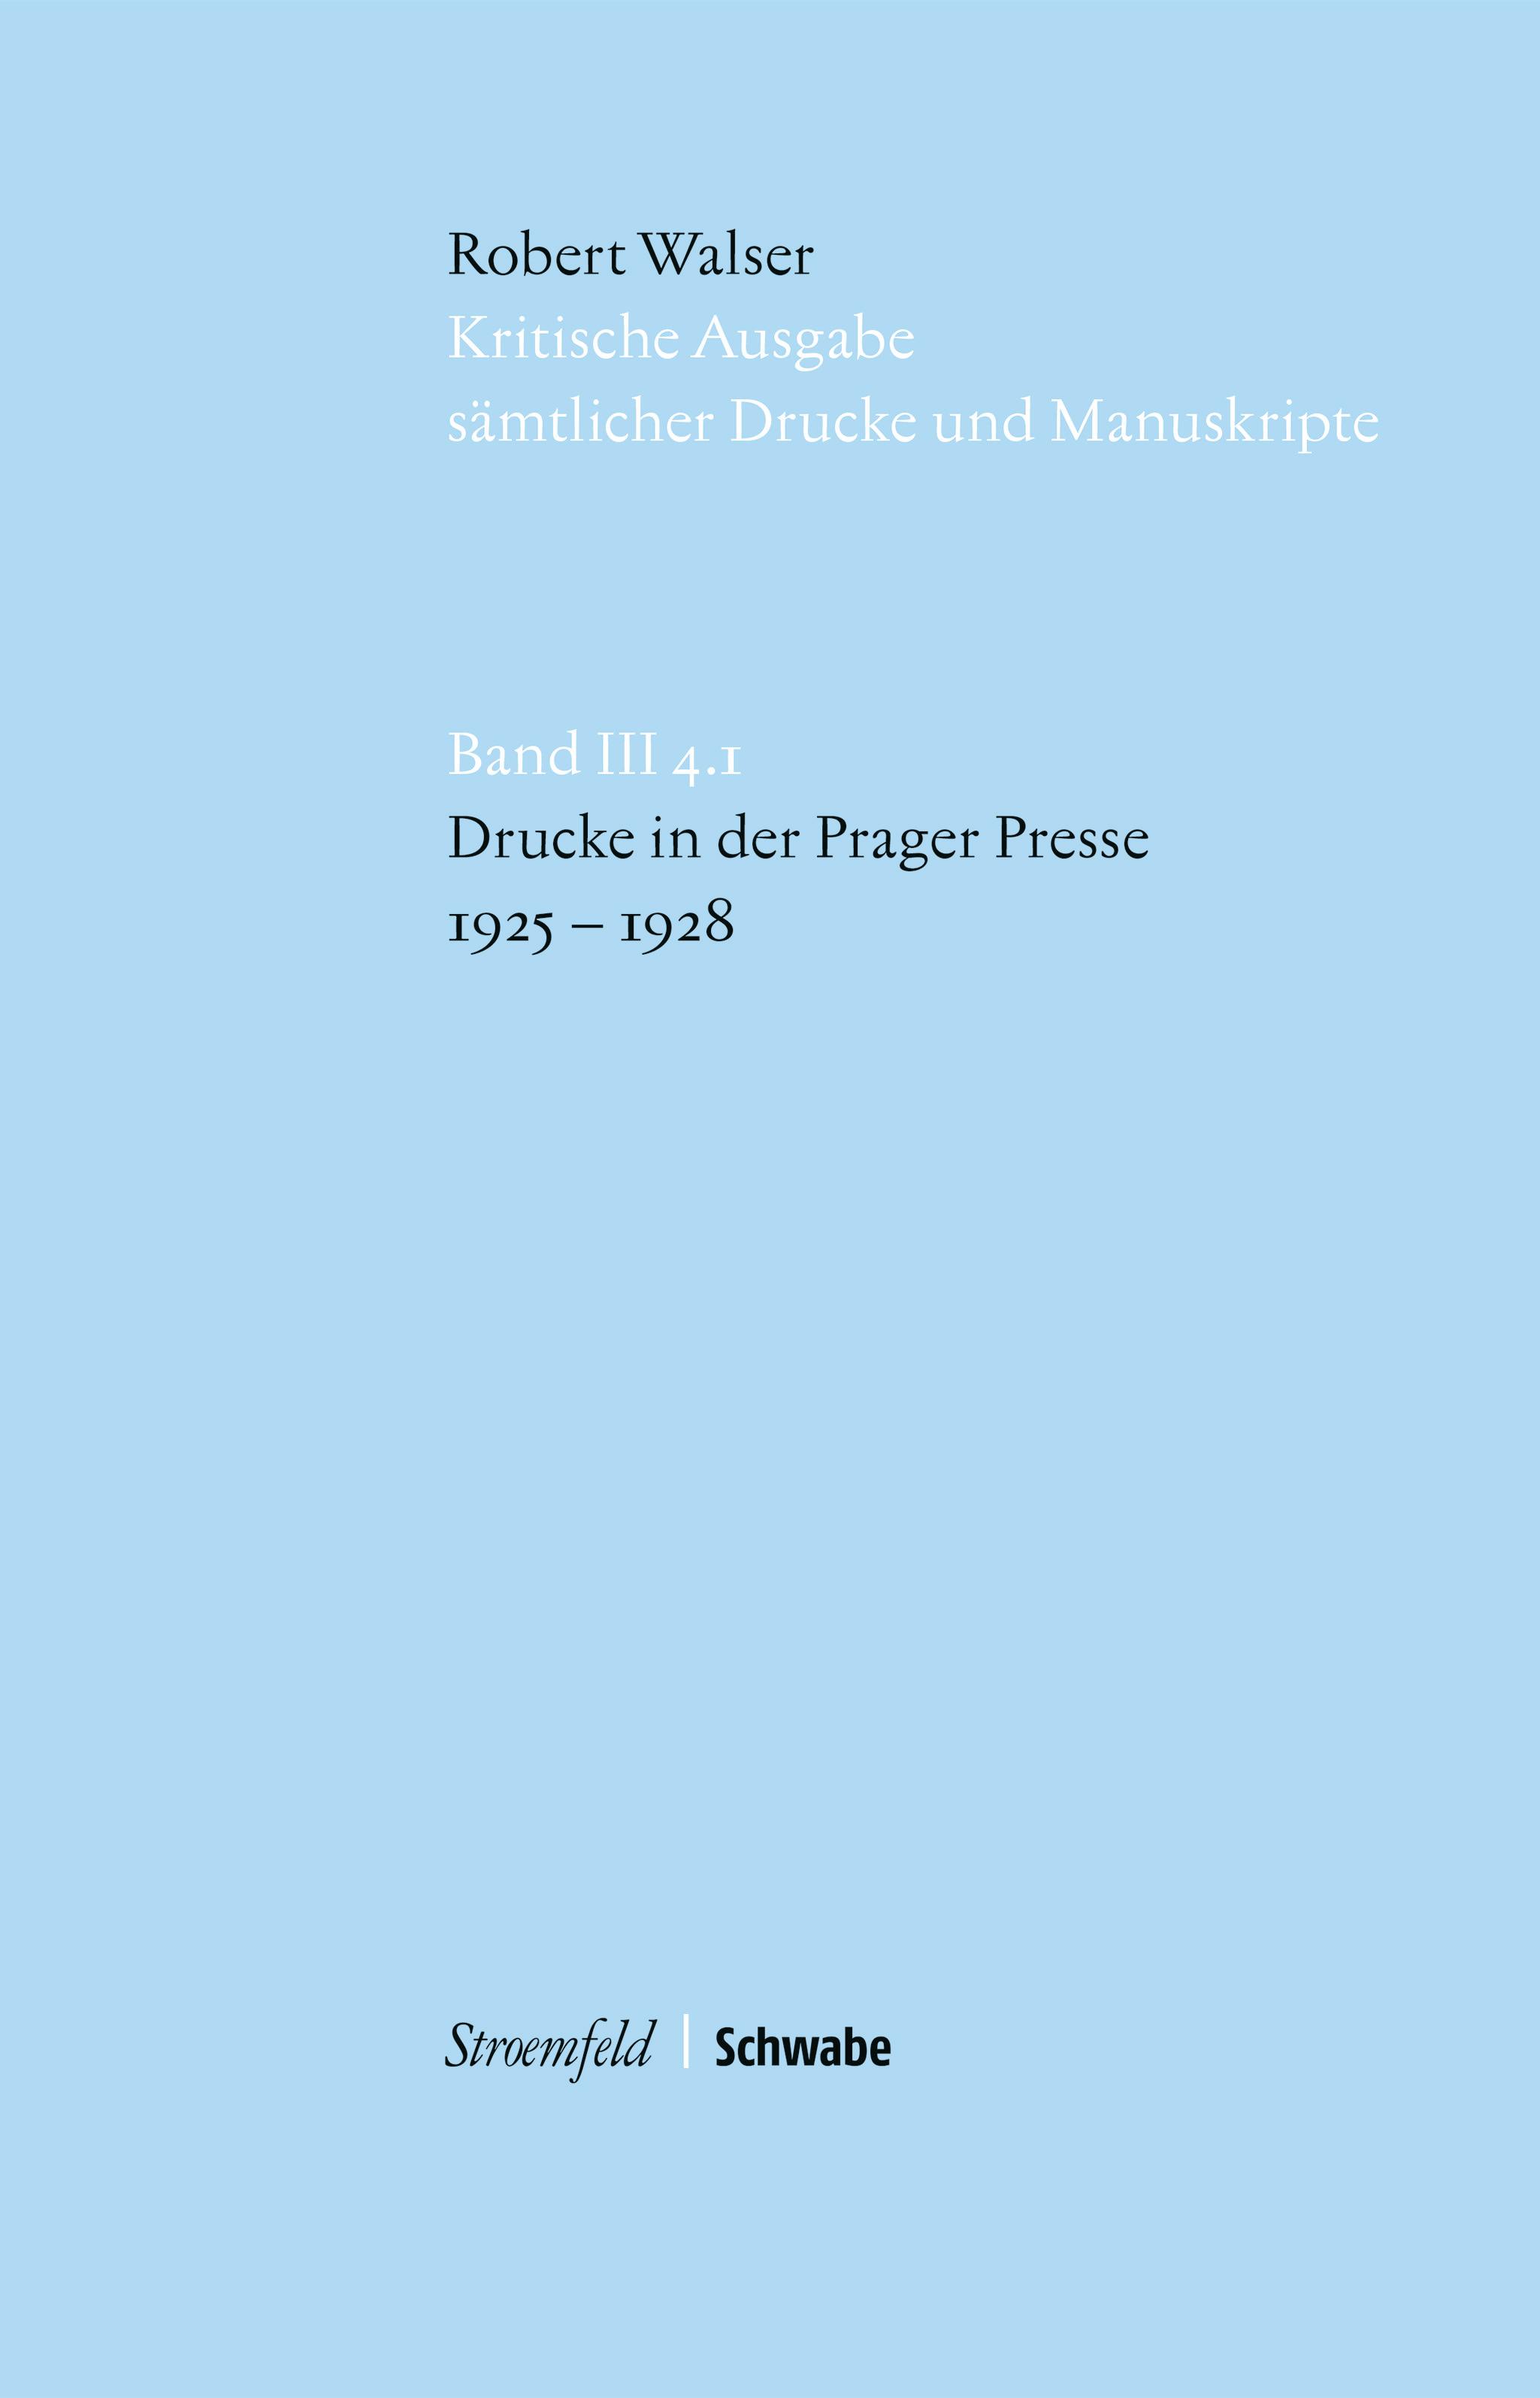 Kritische Robert Walser-Ausgabe, Abt. III Drucke in Zeitungen